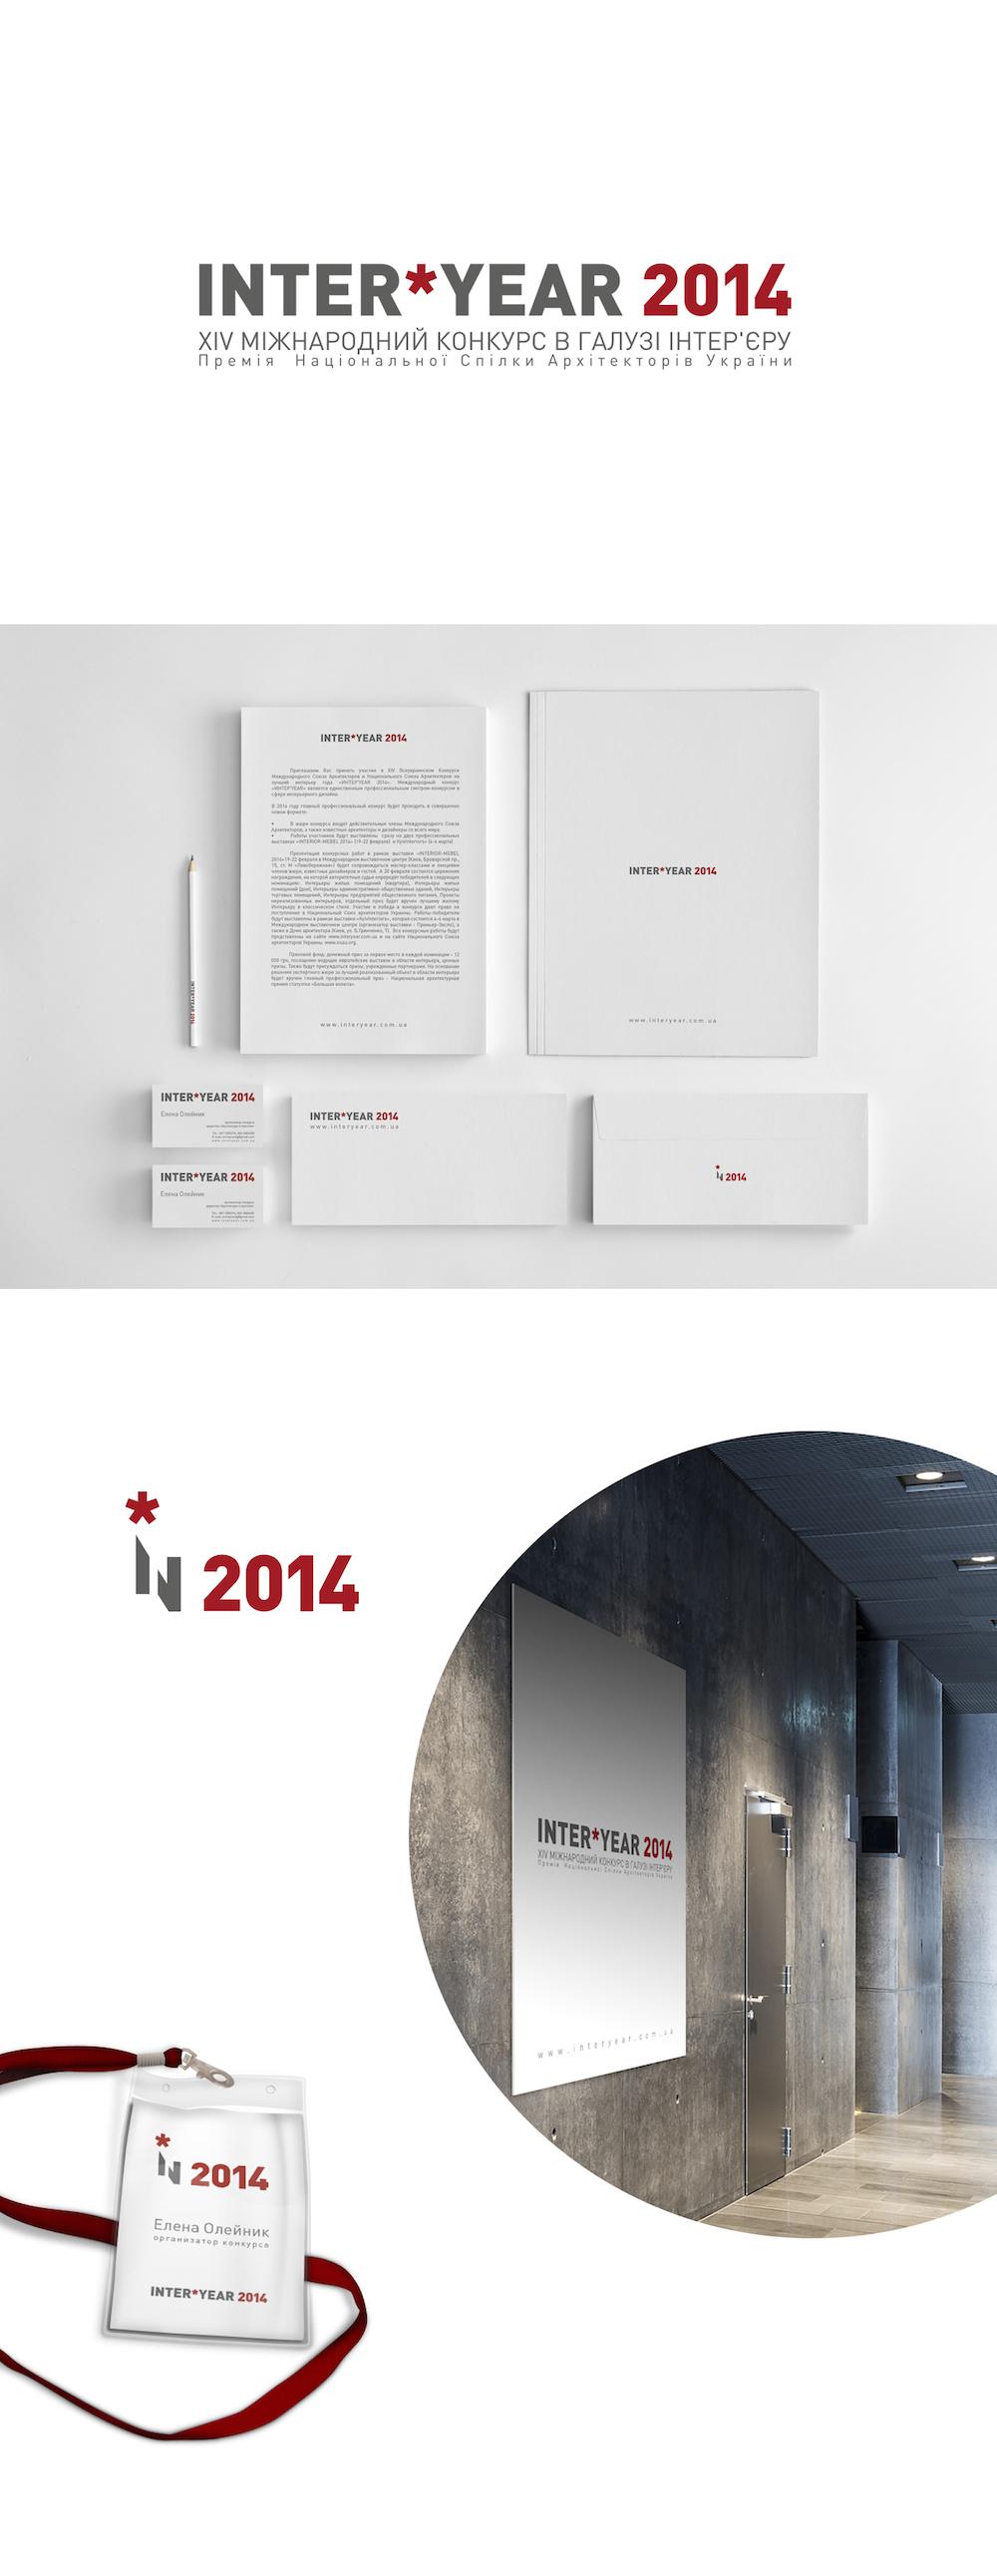 InterYEAR-2014-Branding-3